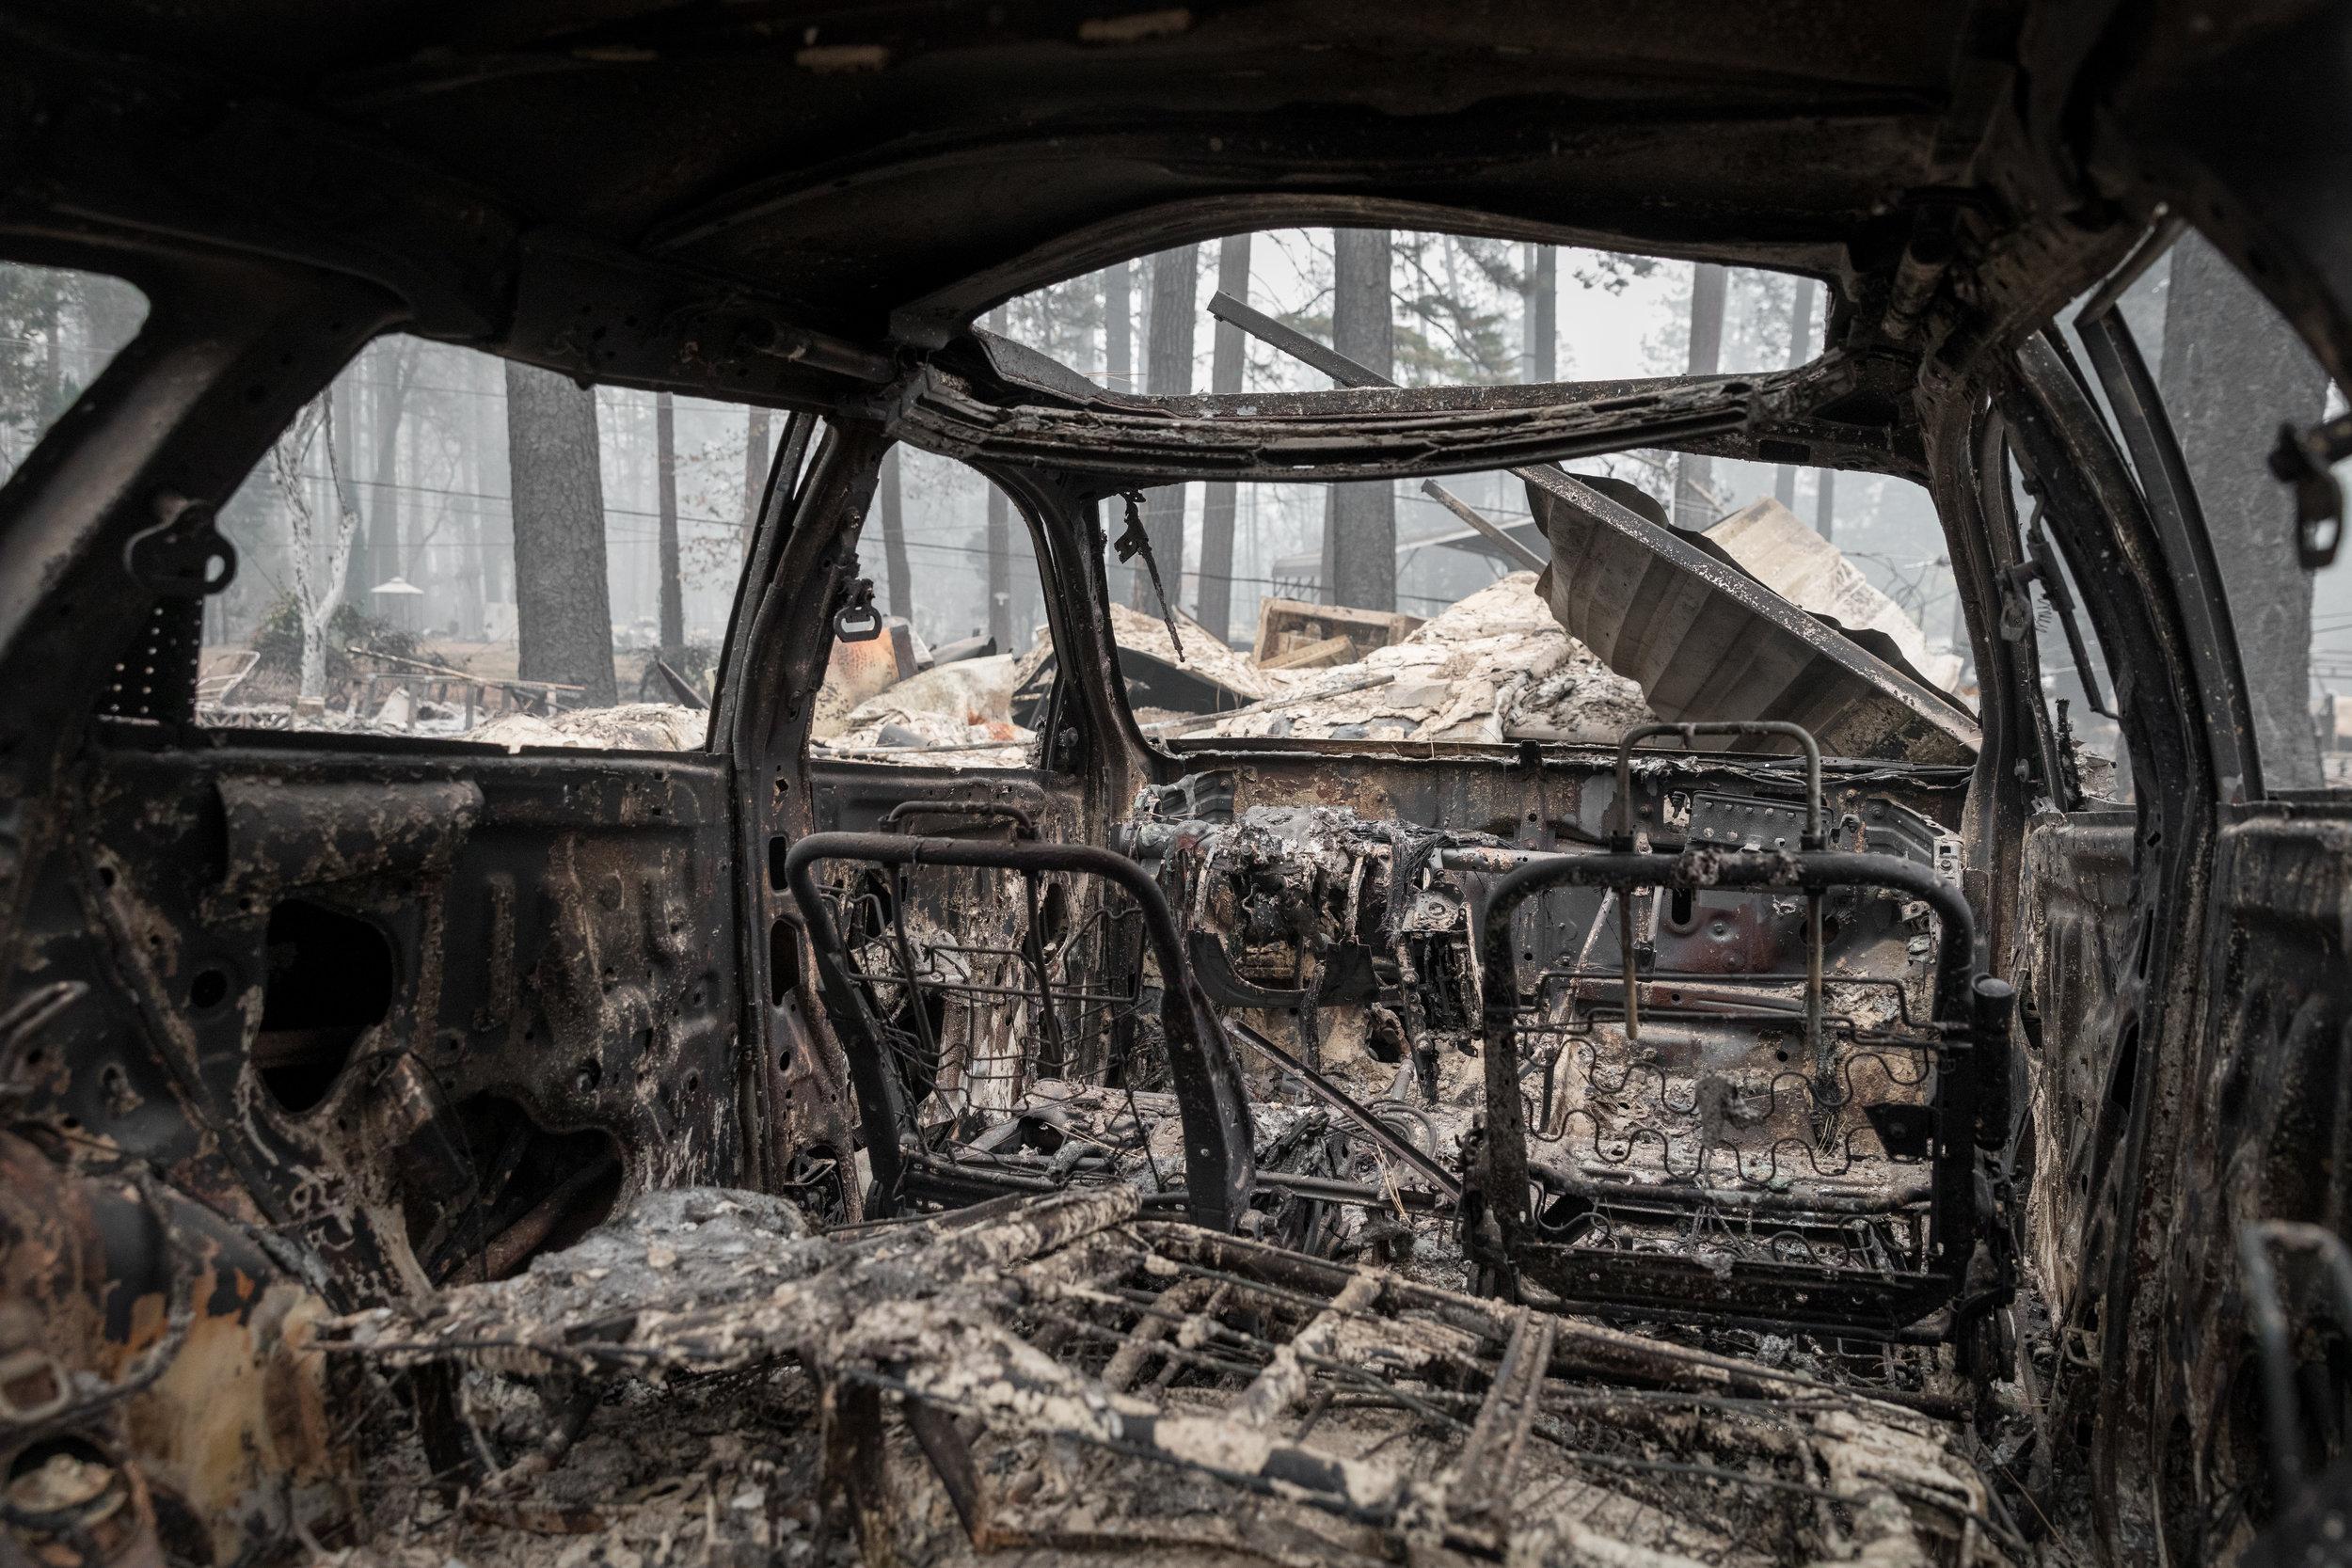 Interior of a charred vehicle, Paradise, CA — November 14th, 2018